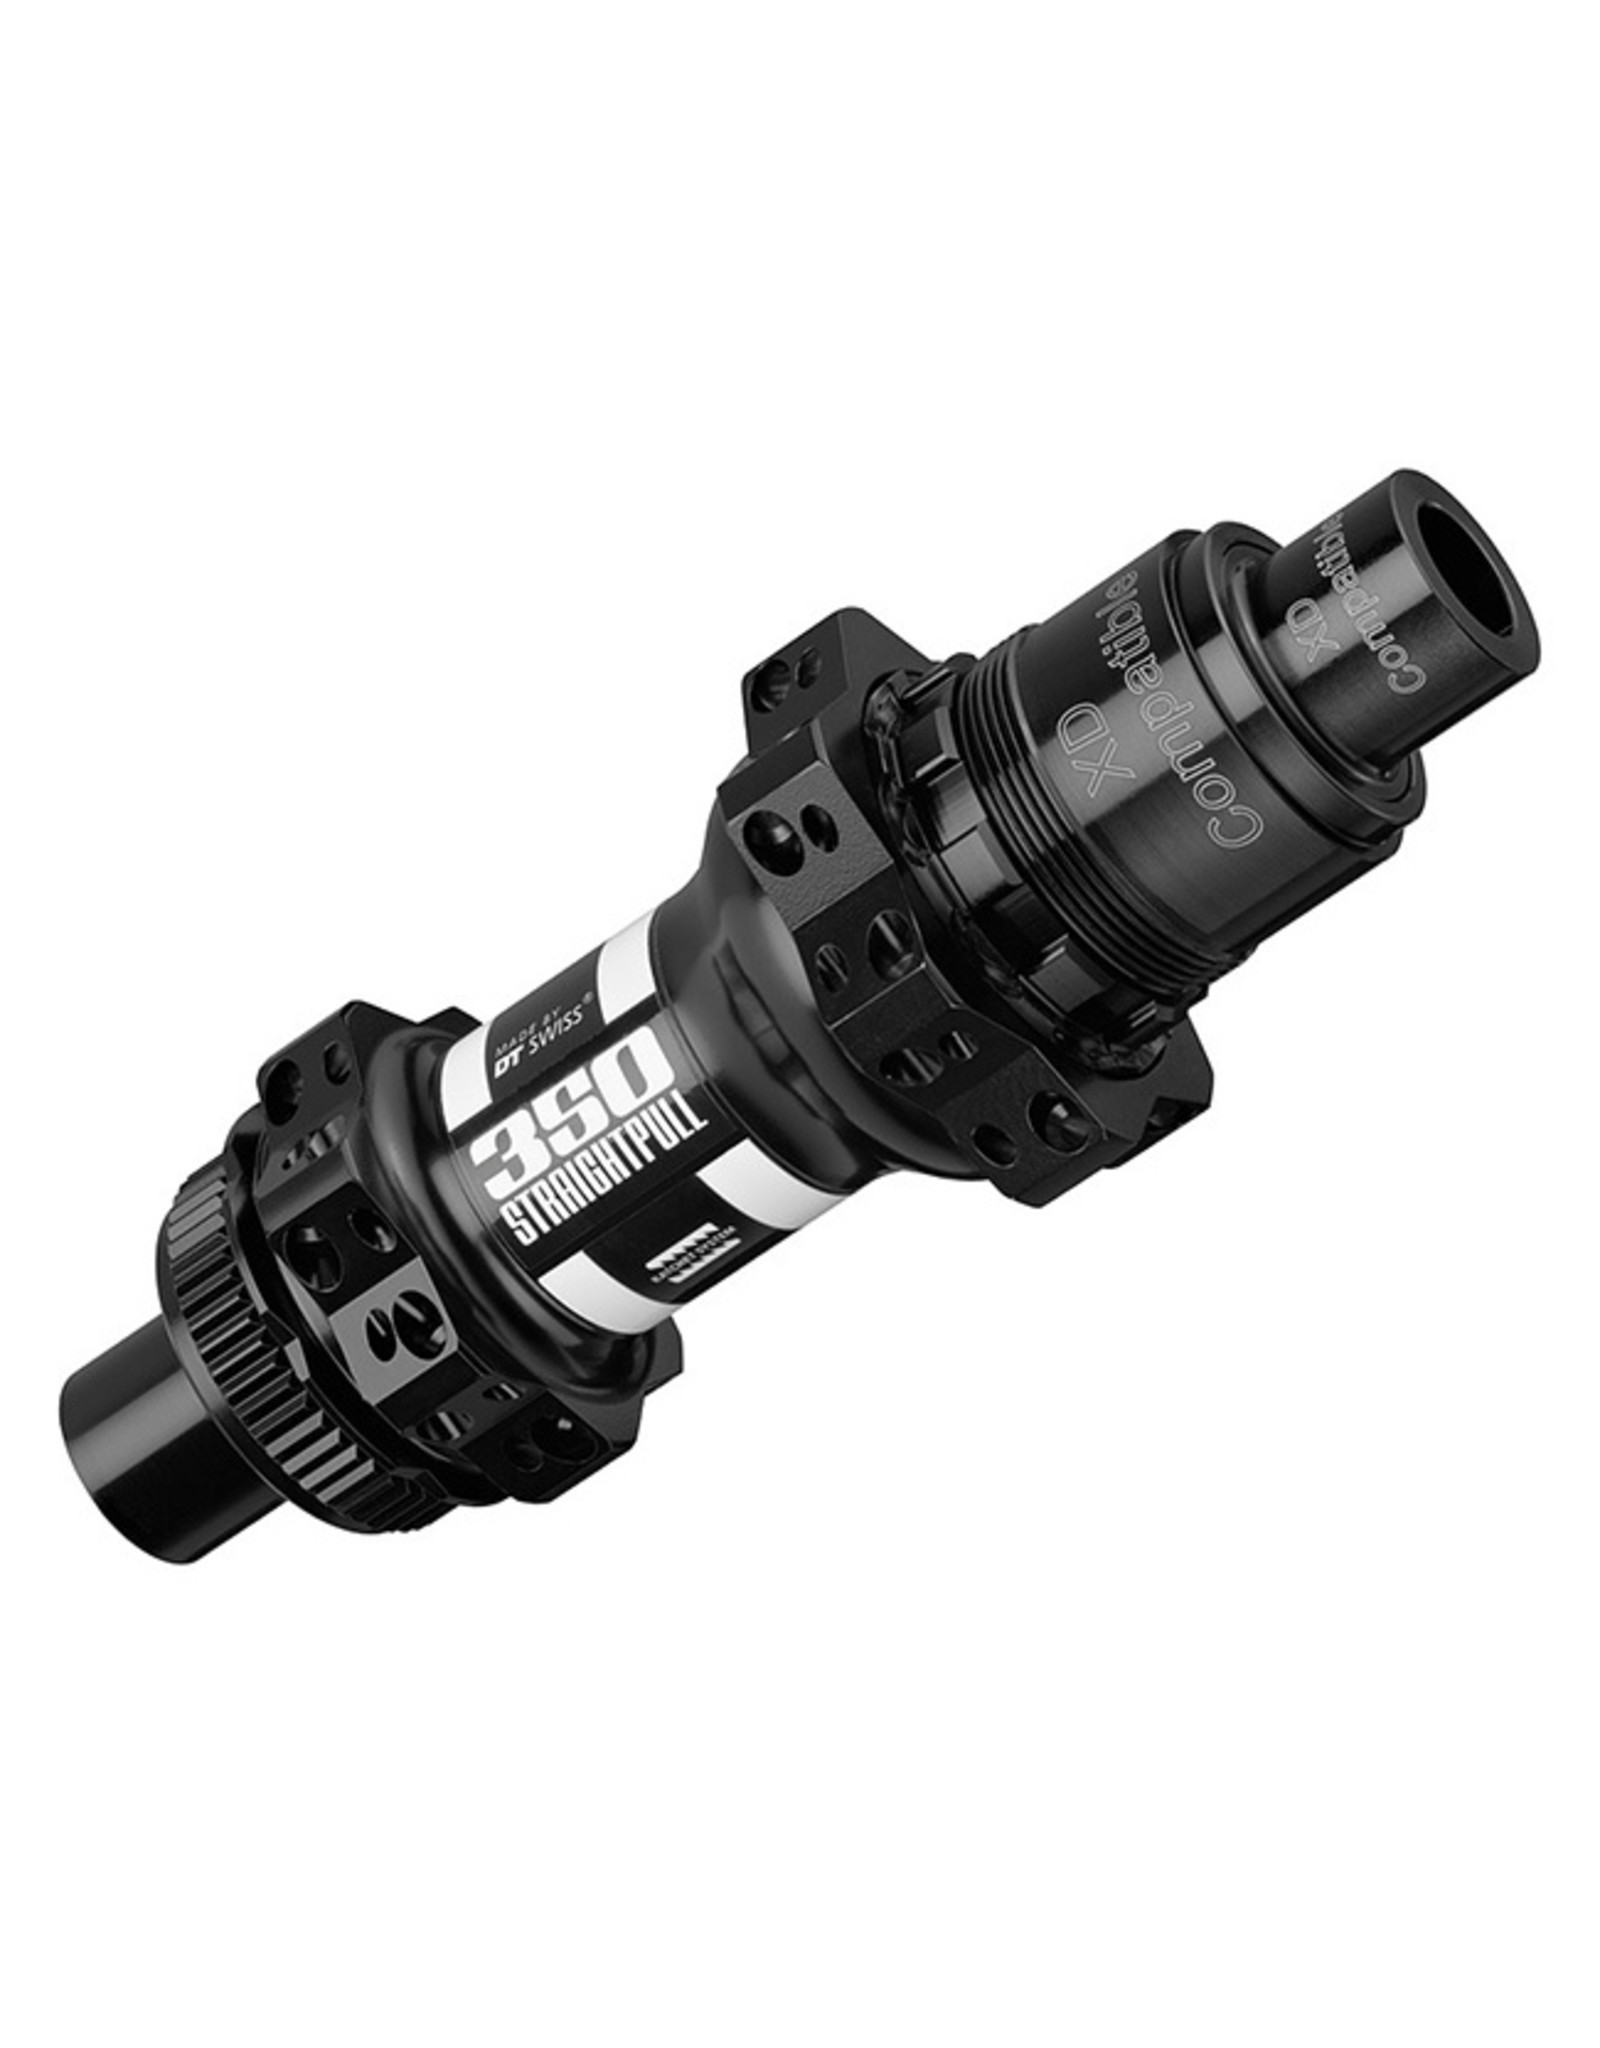 DT Swiss DT Swiss 350 Boost Straight-Pull Centerlock Rear Hub